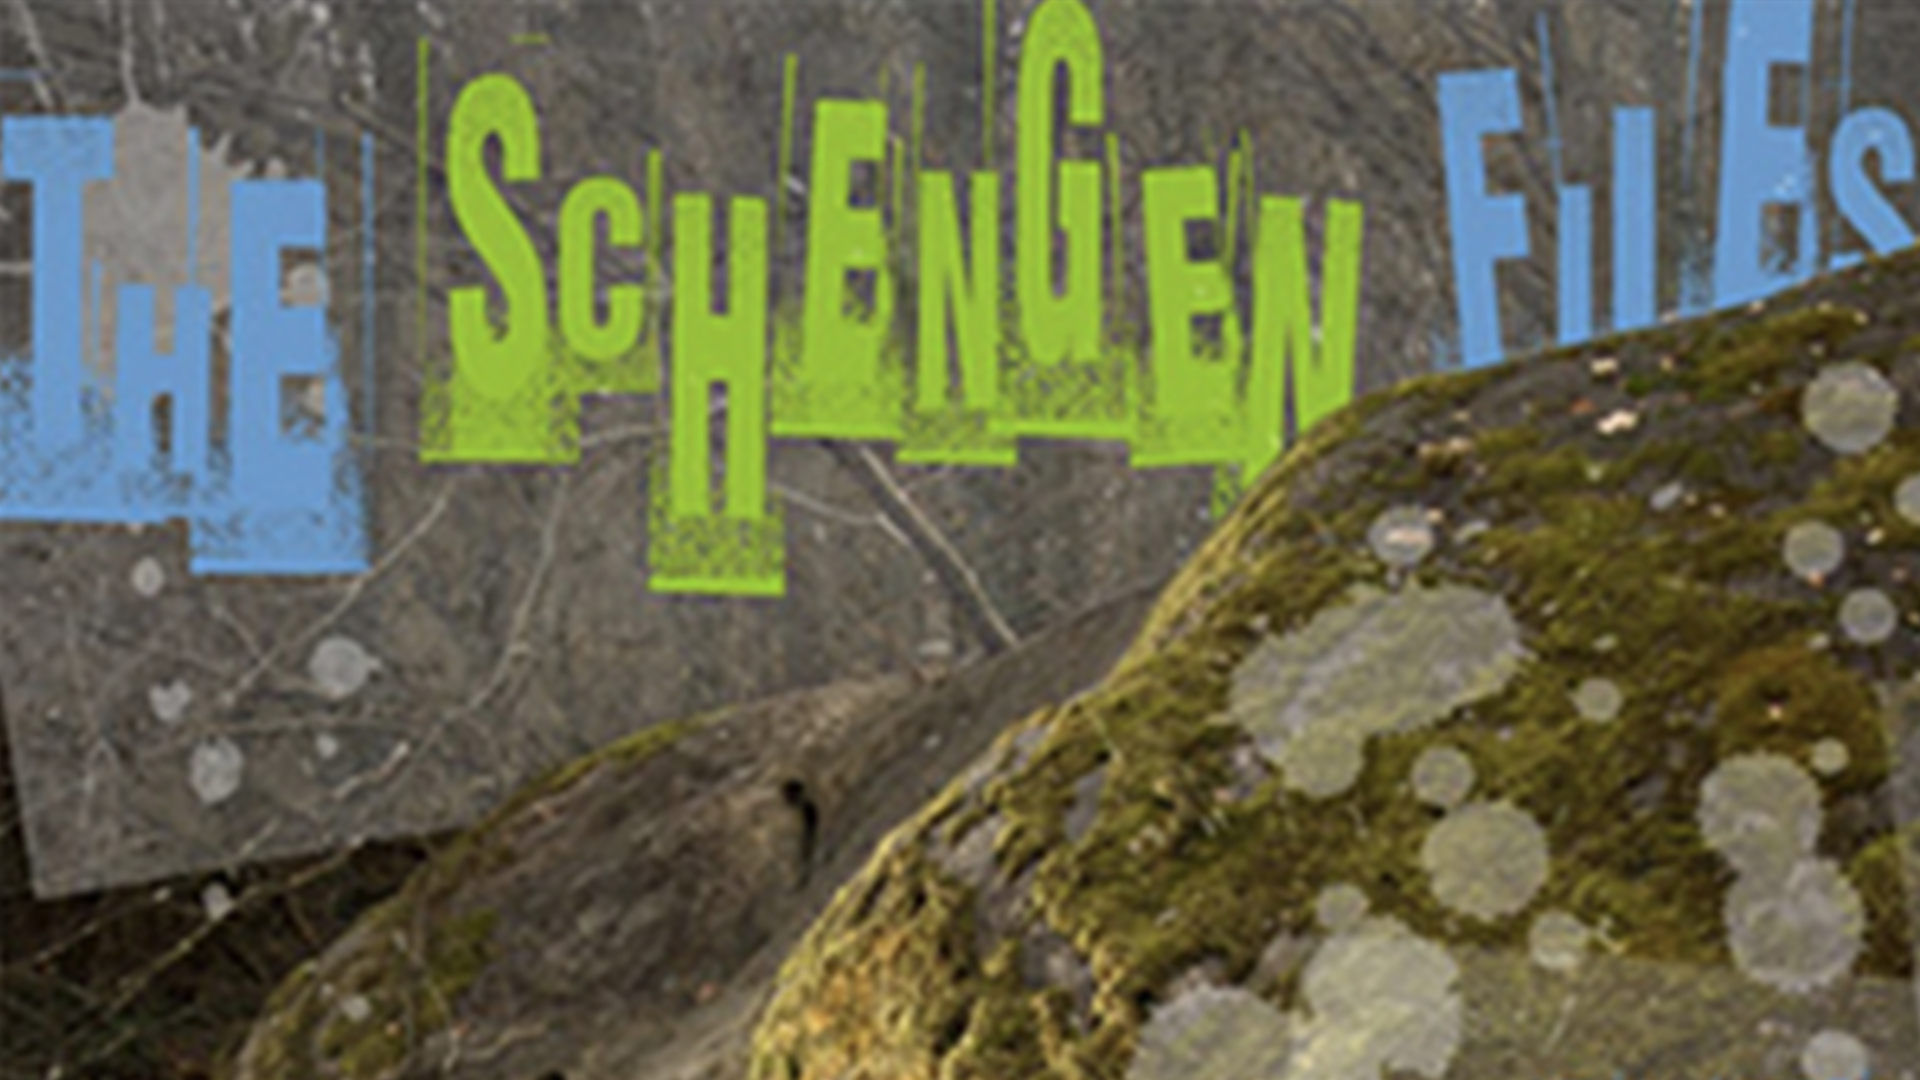 The Schengen Files